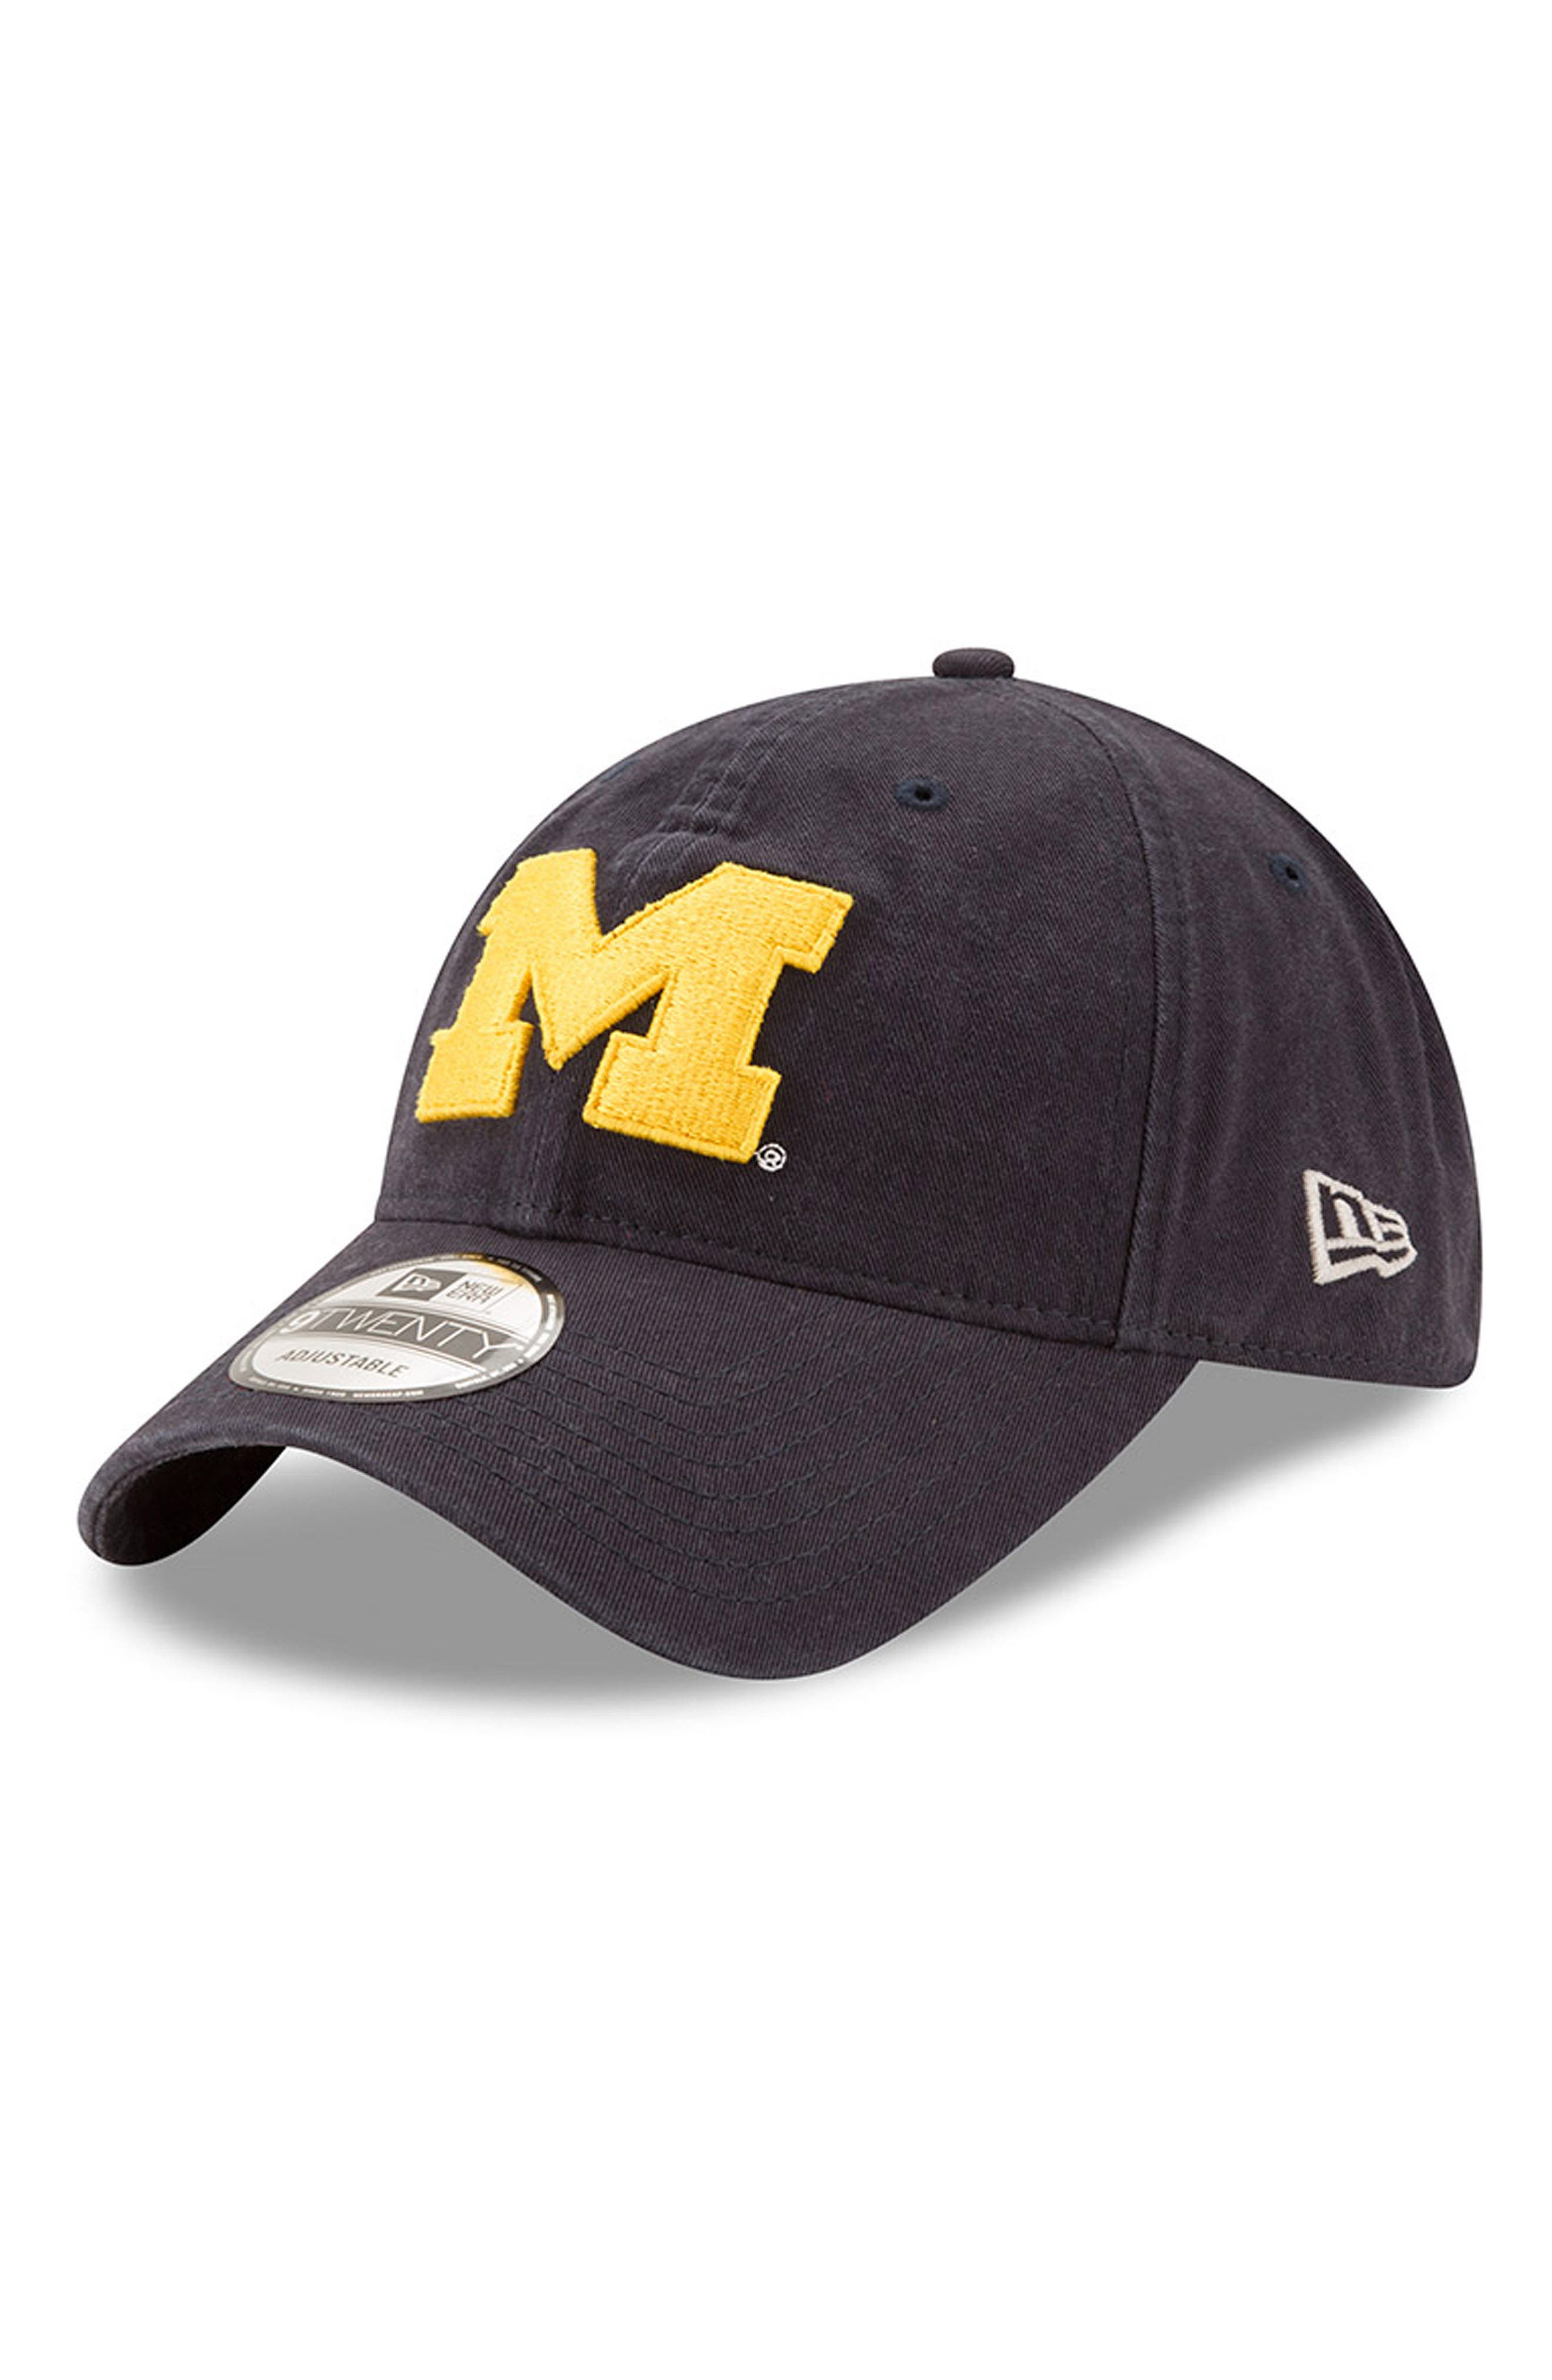 New Era Collegiate Core Classic - Michigan Wolverines Baseball Cap,                         Main,                         color, Michigan Wolverines